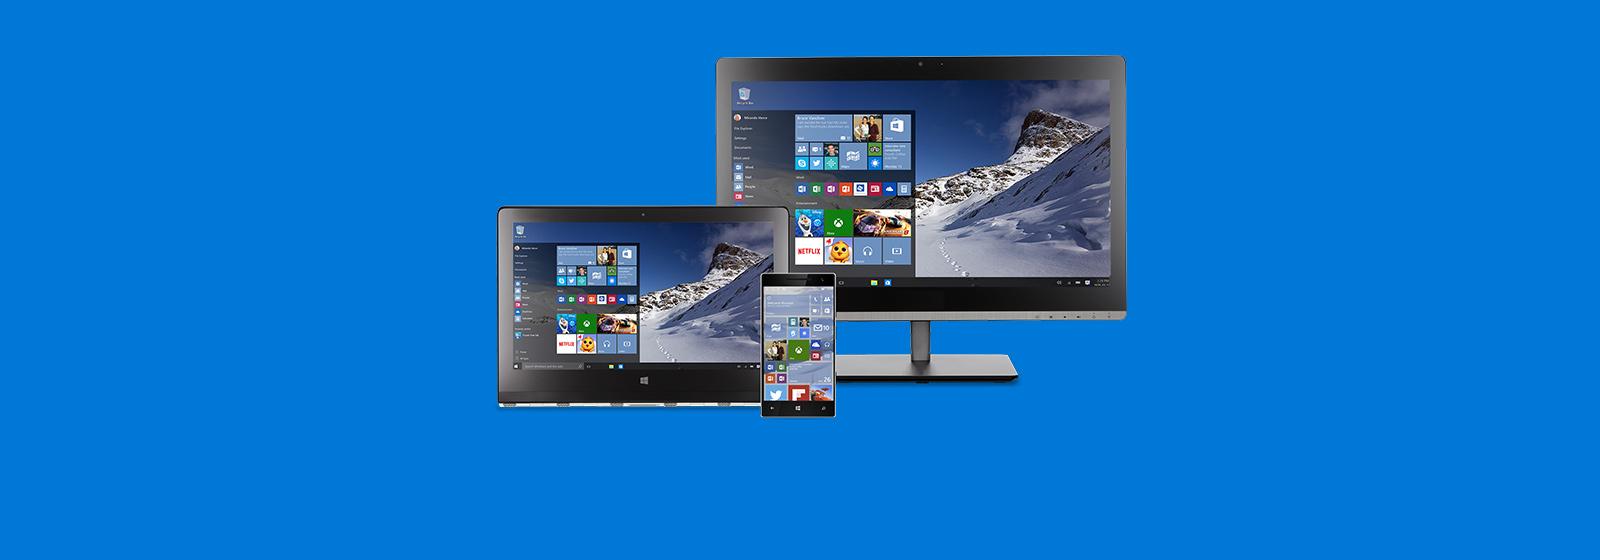 Windows10 sera bientôt disponible. Plus d'informations.